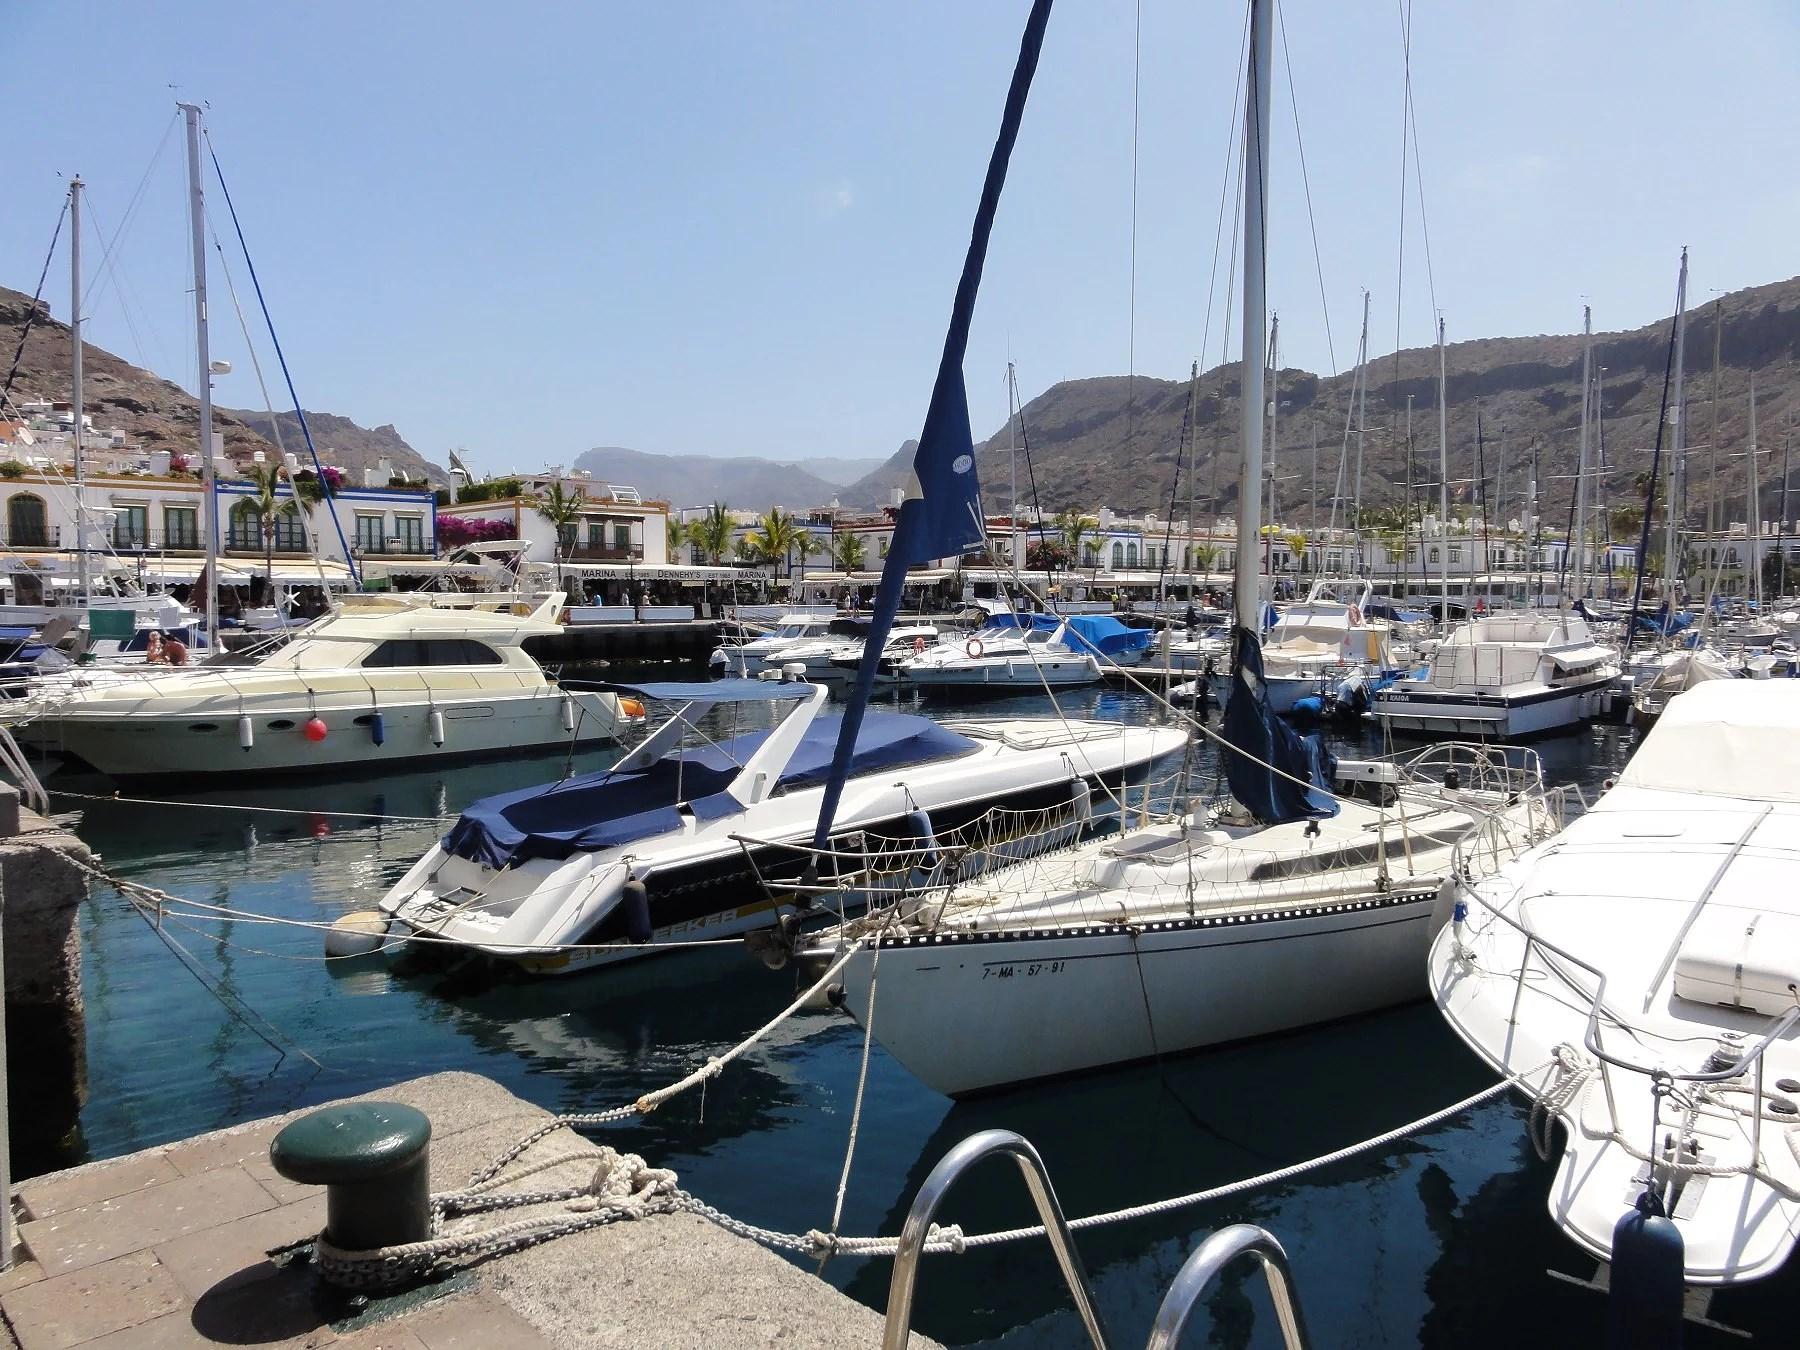 8 anbefalte opplevelser på Gran Canaria